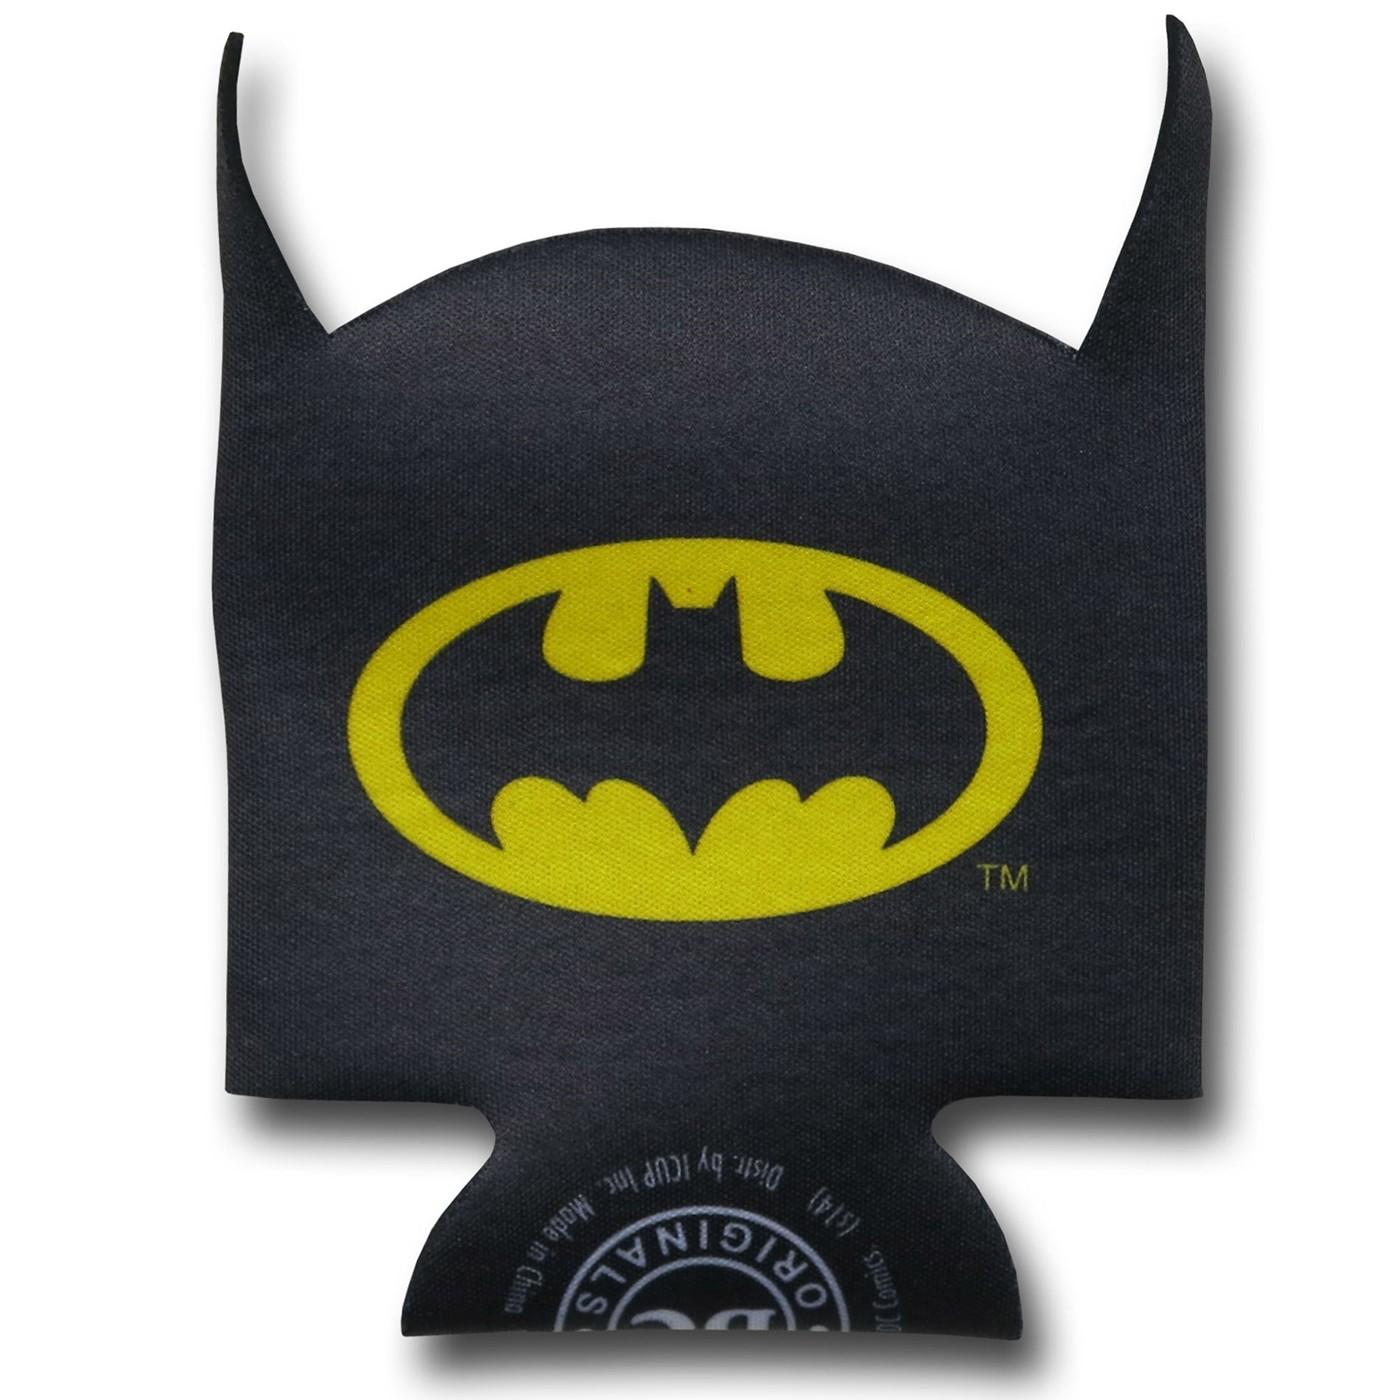 Batman Face Can and Bottle Cooler